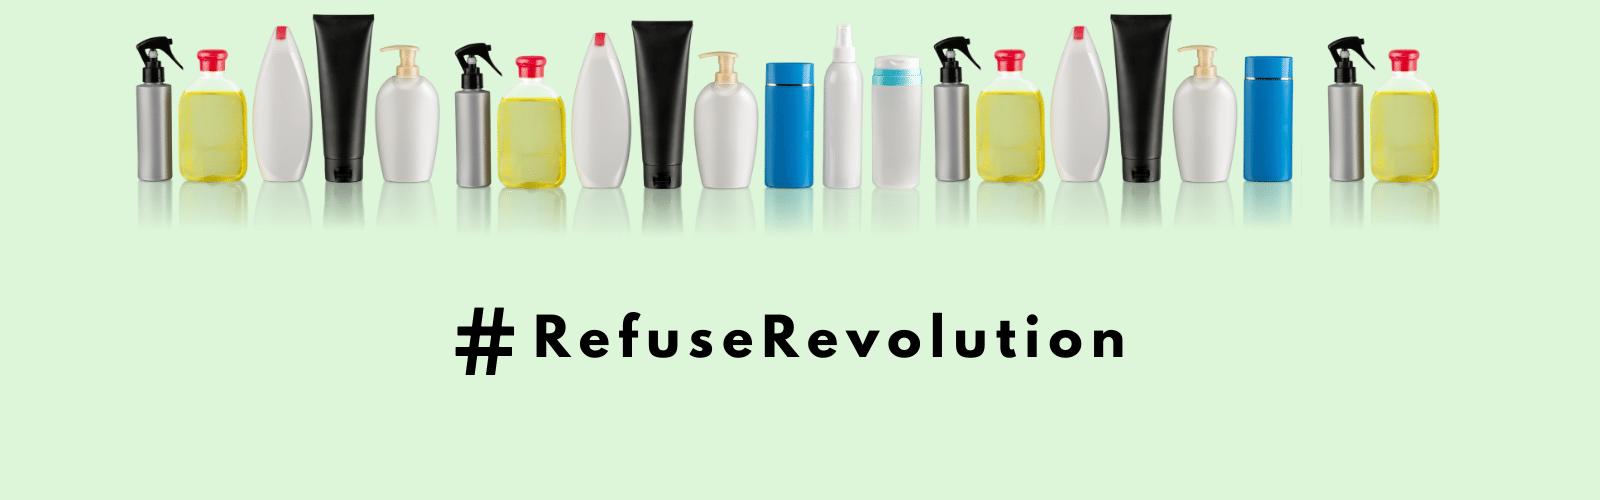 #RefuseRevolution